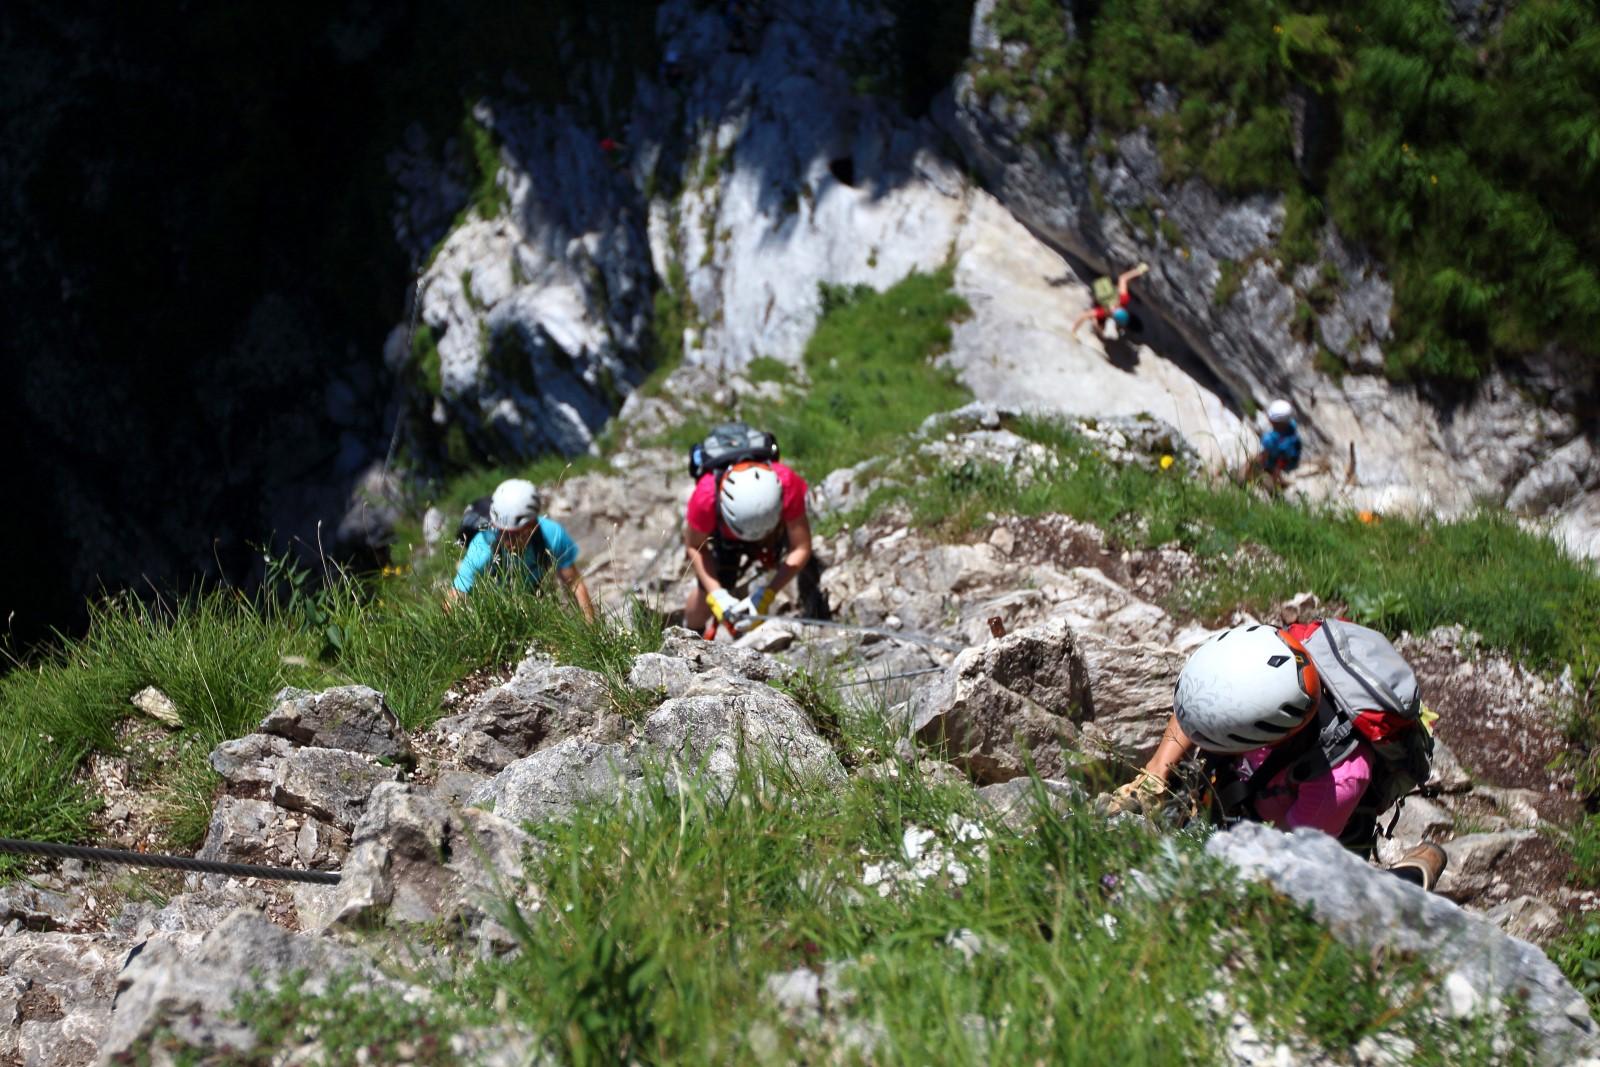 Klettersteig Rakousko : Klettersteig rakousko kaiserschild bergsteigen